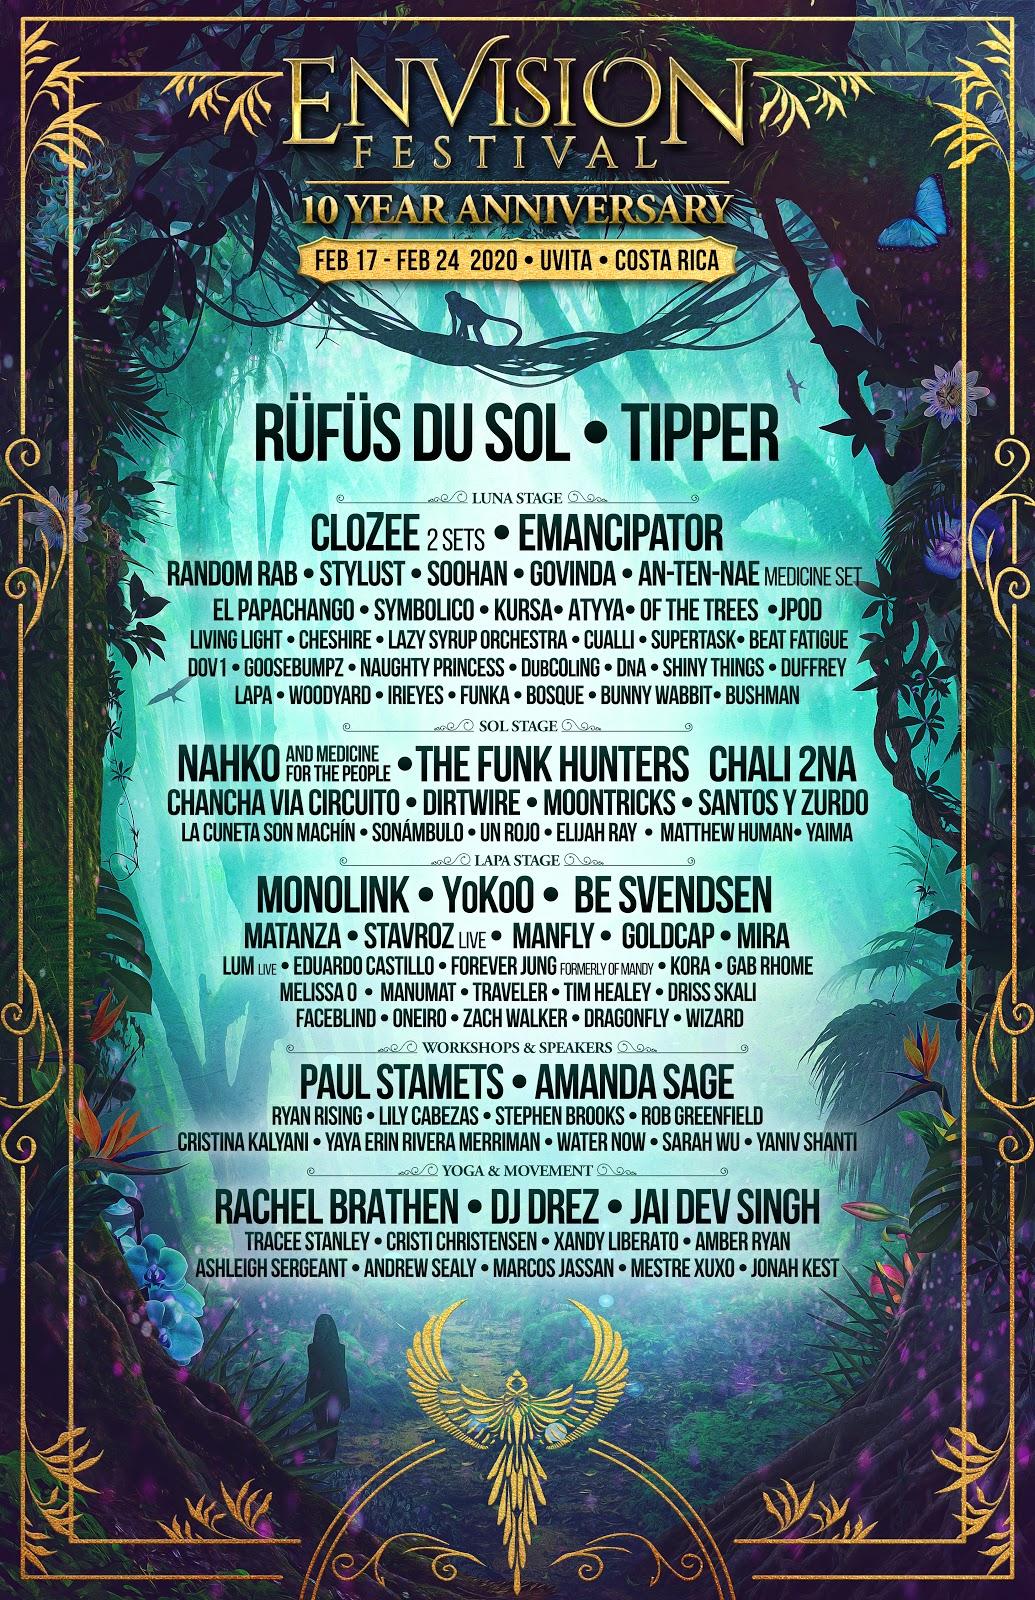 Envision Festival 2020 Line-Up